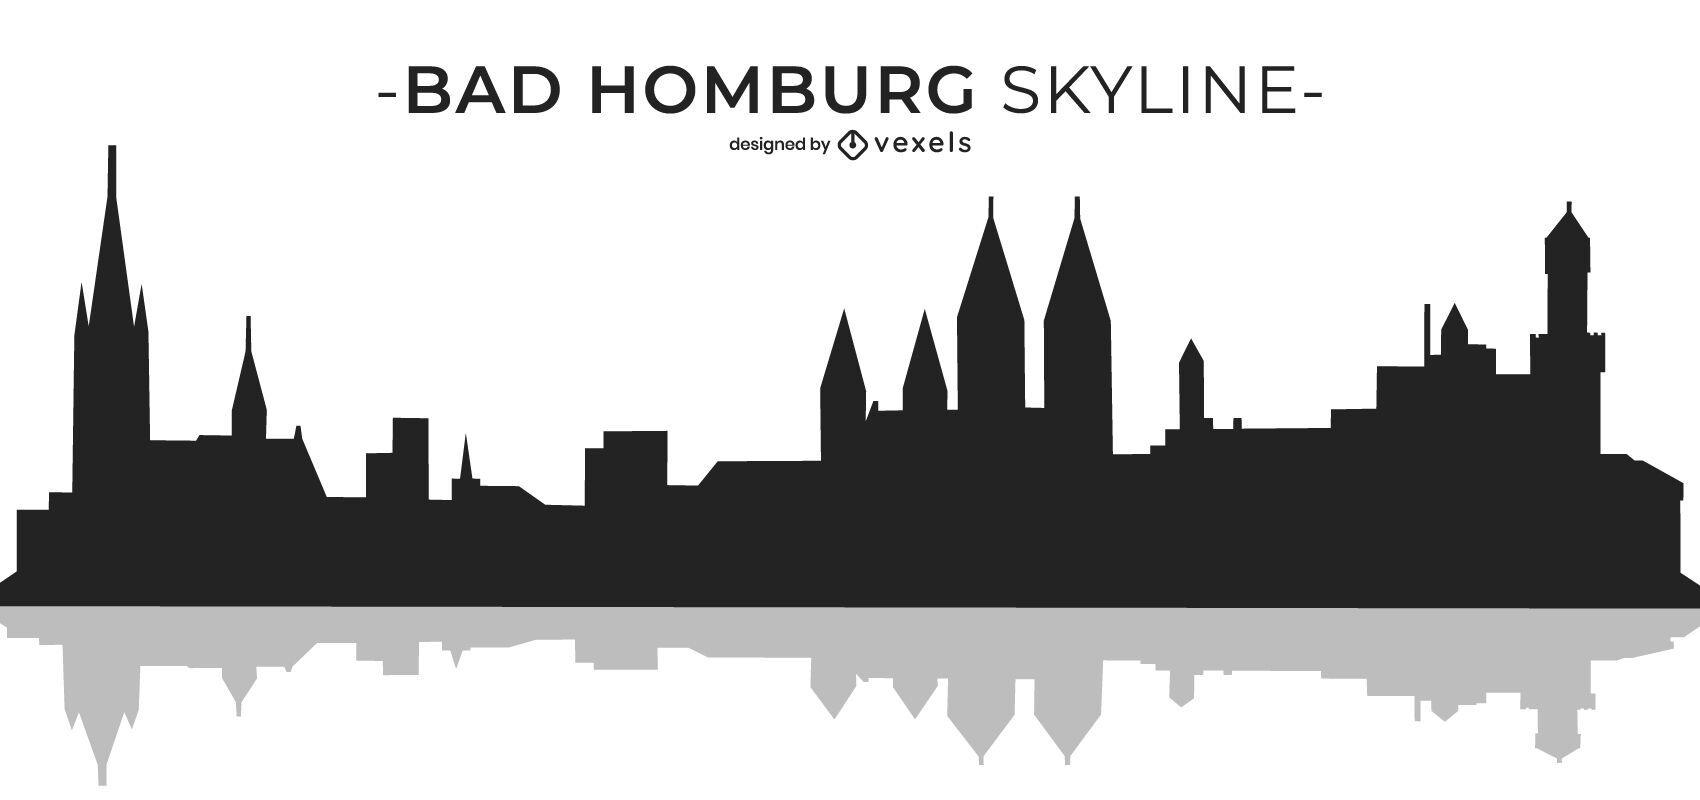 Bad Homburg skyline design